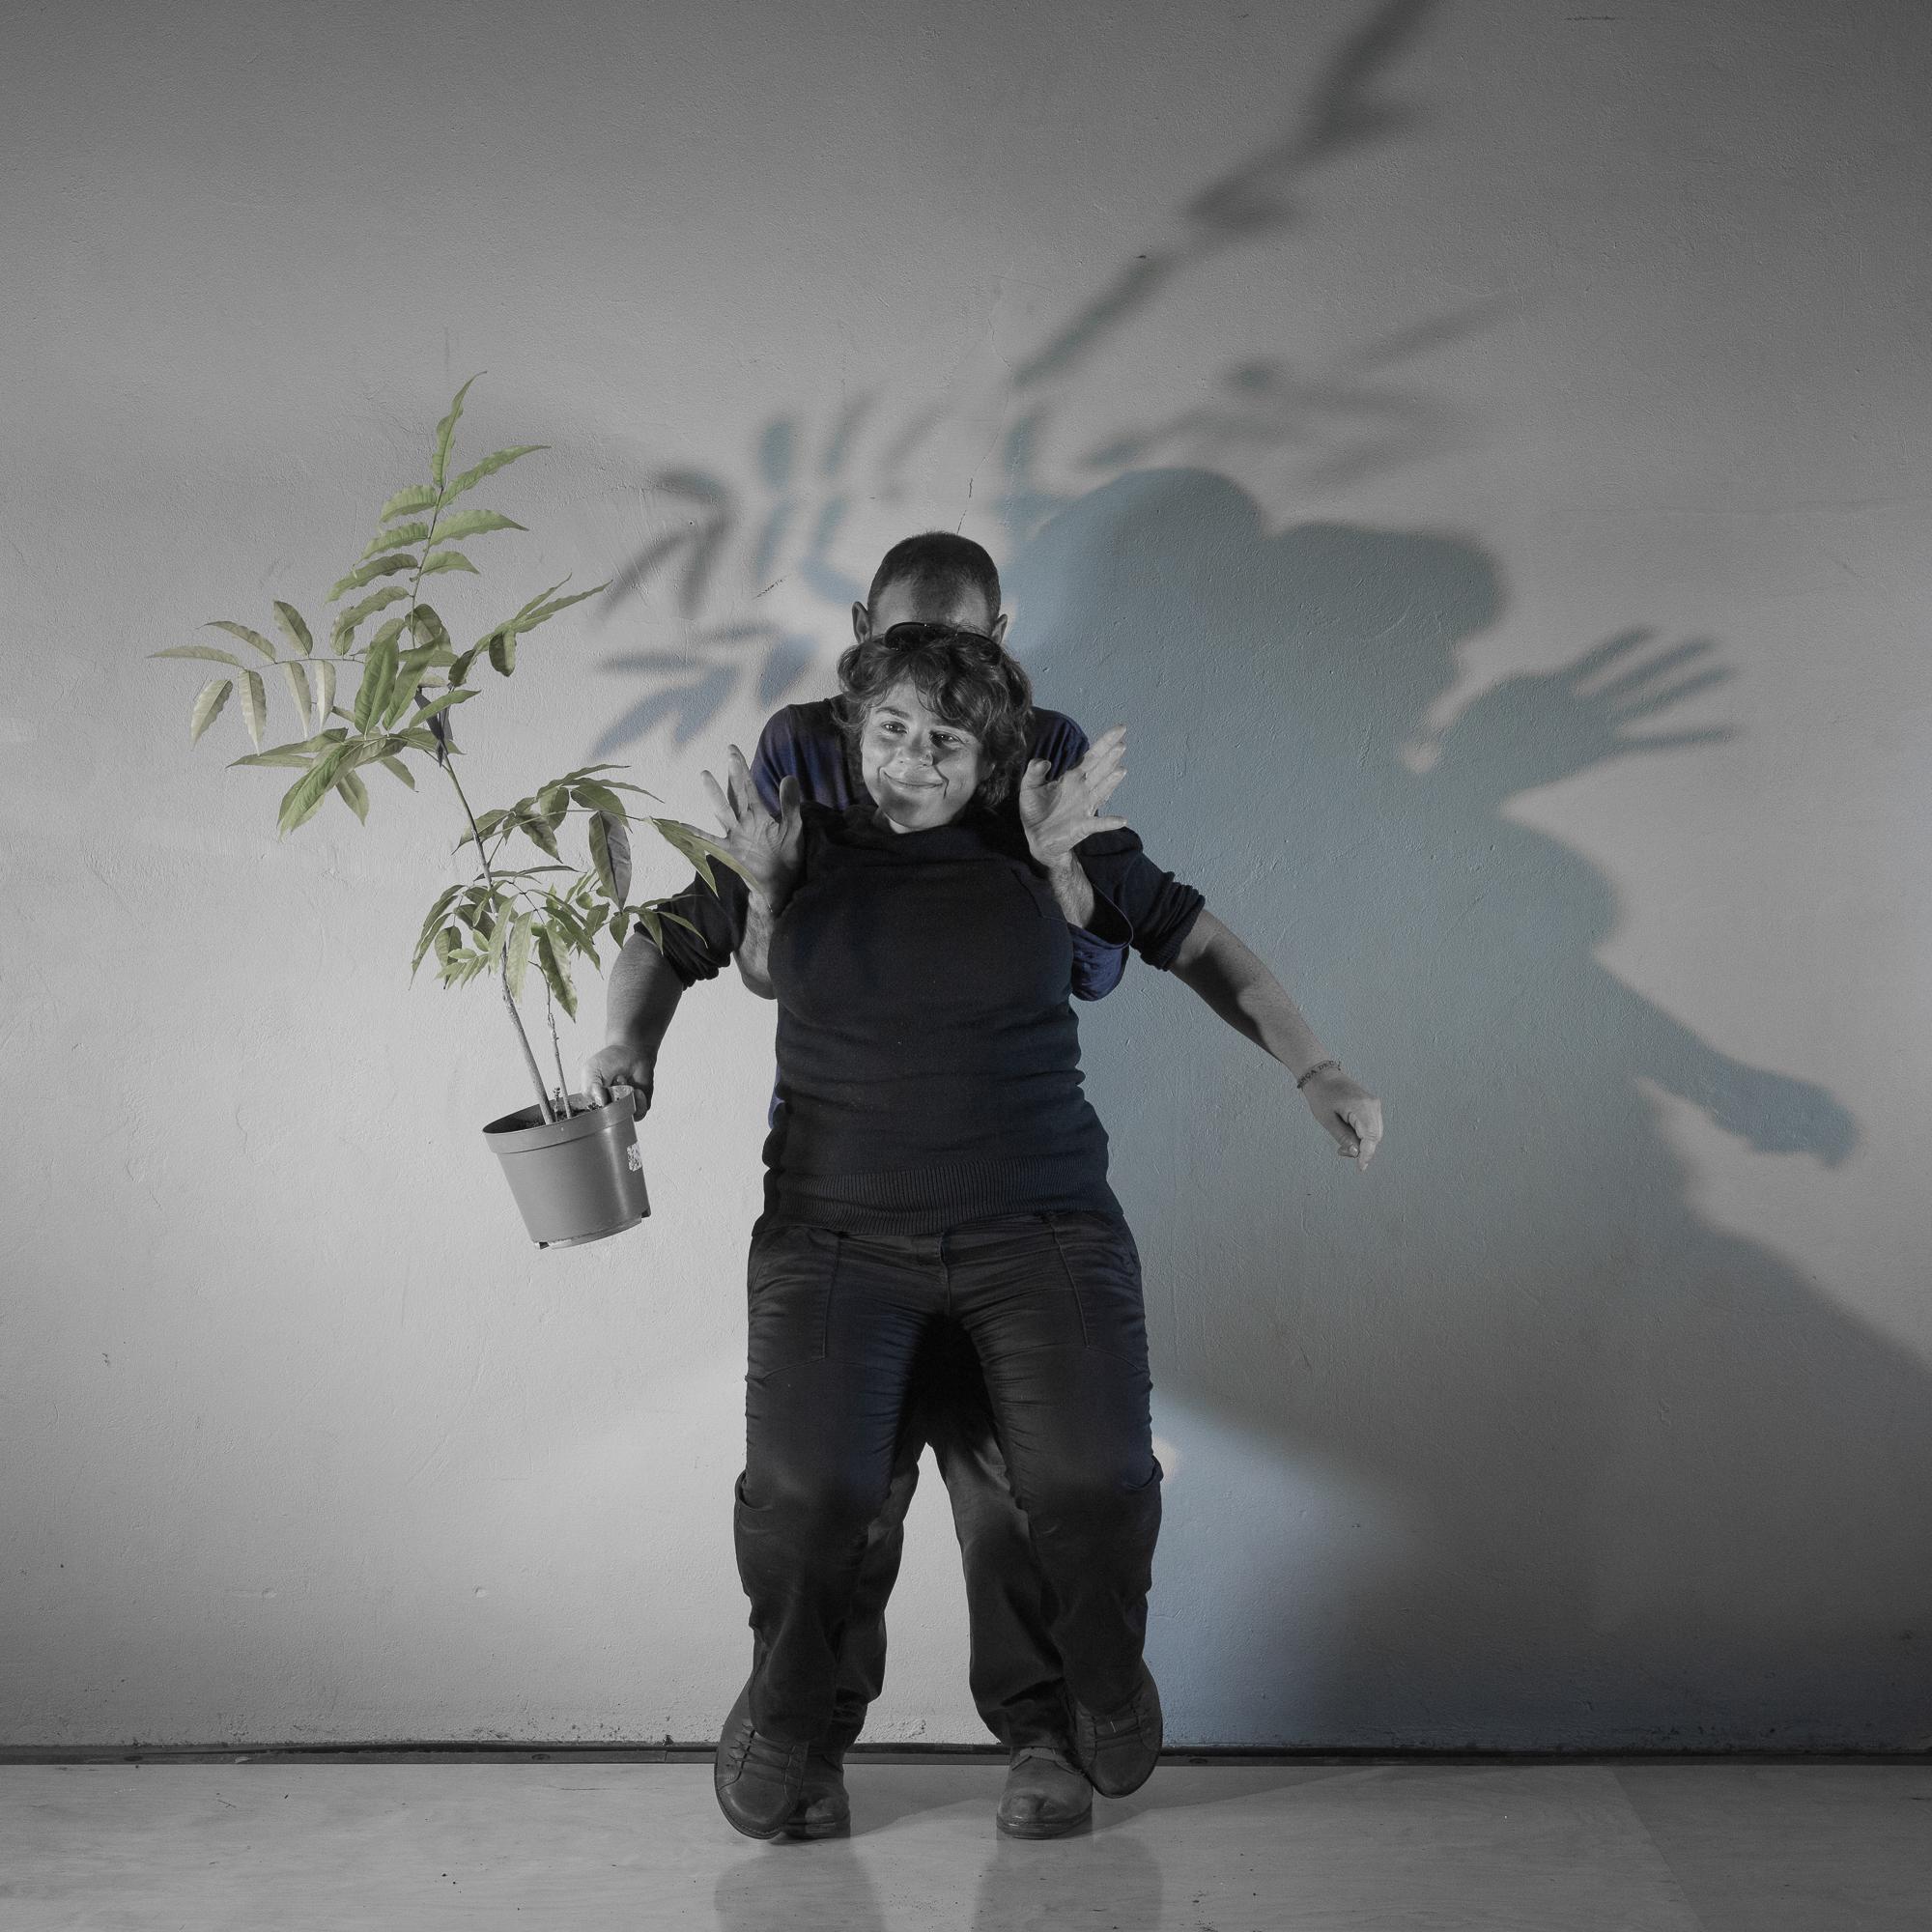 25 ans - Plante